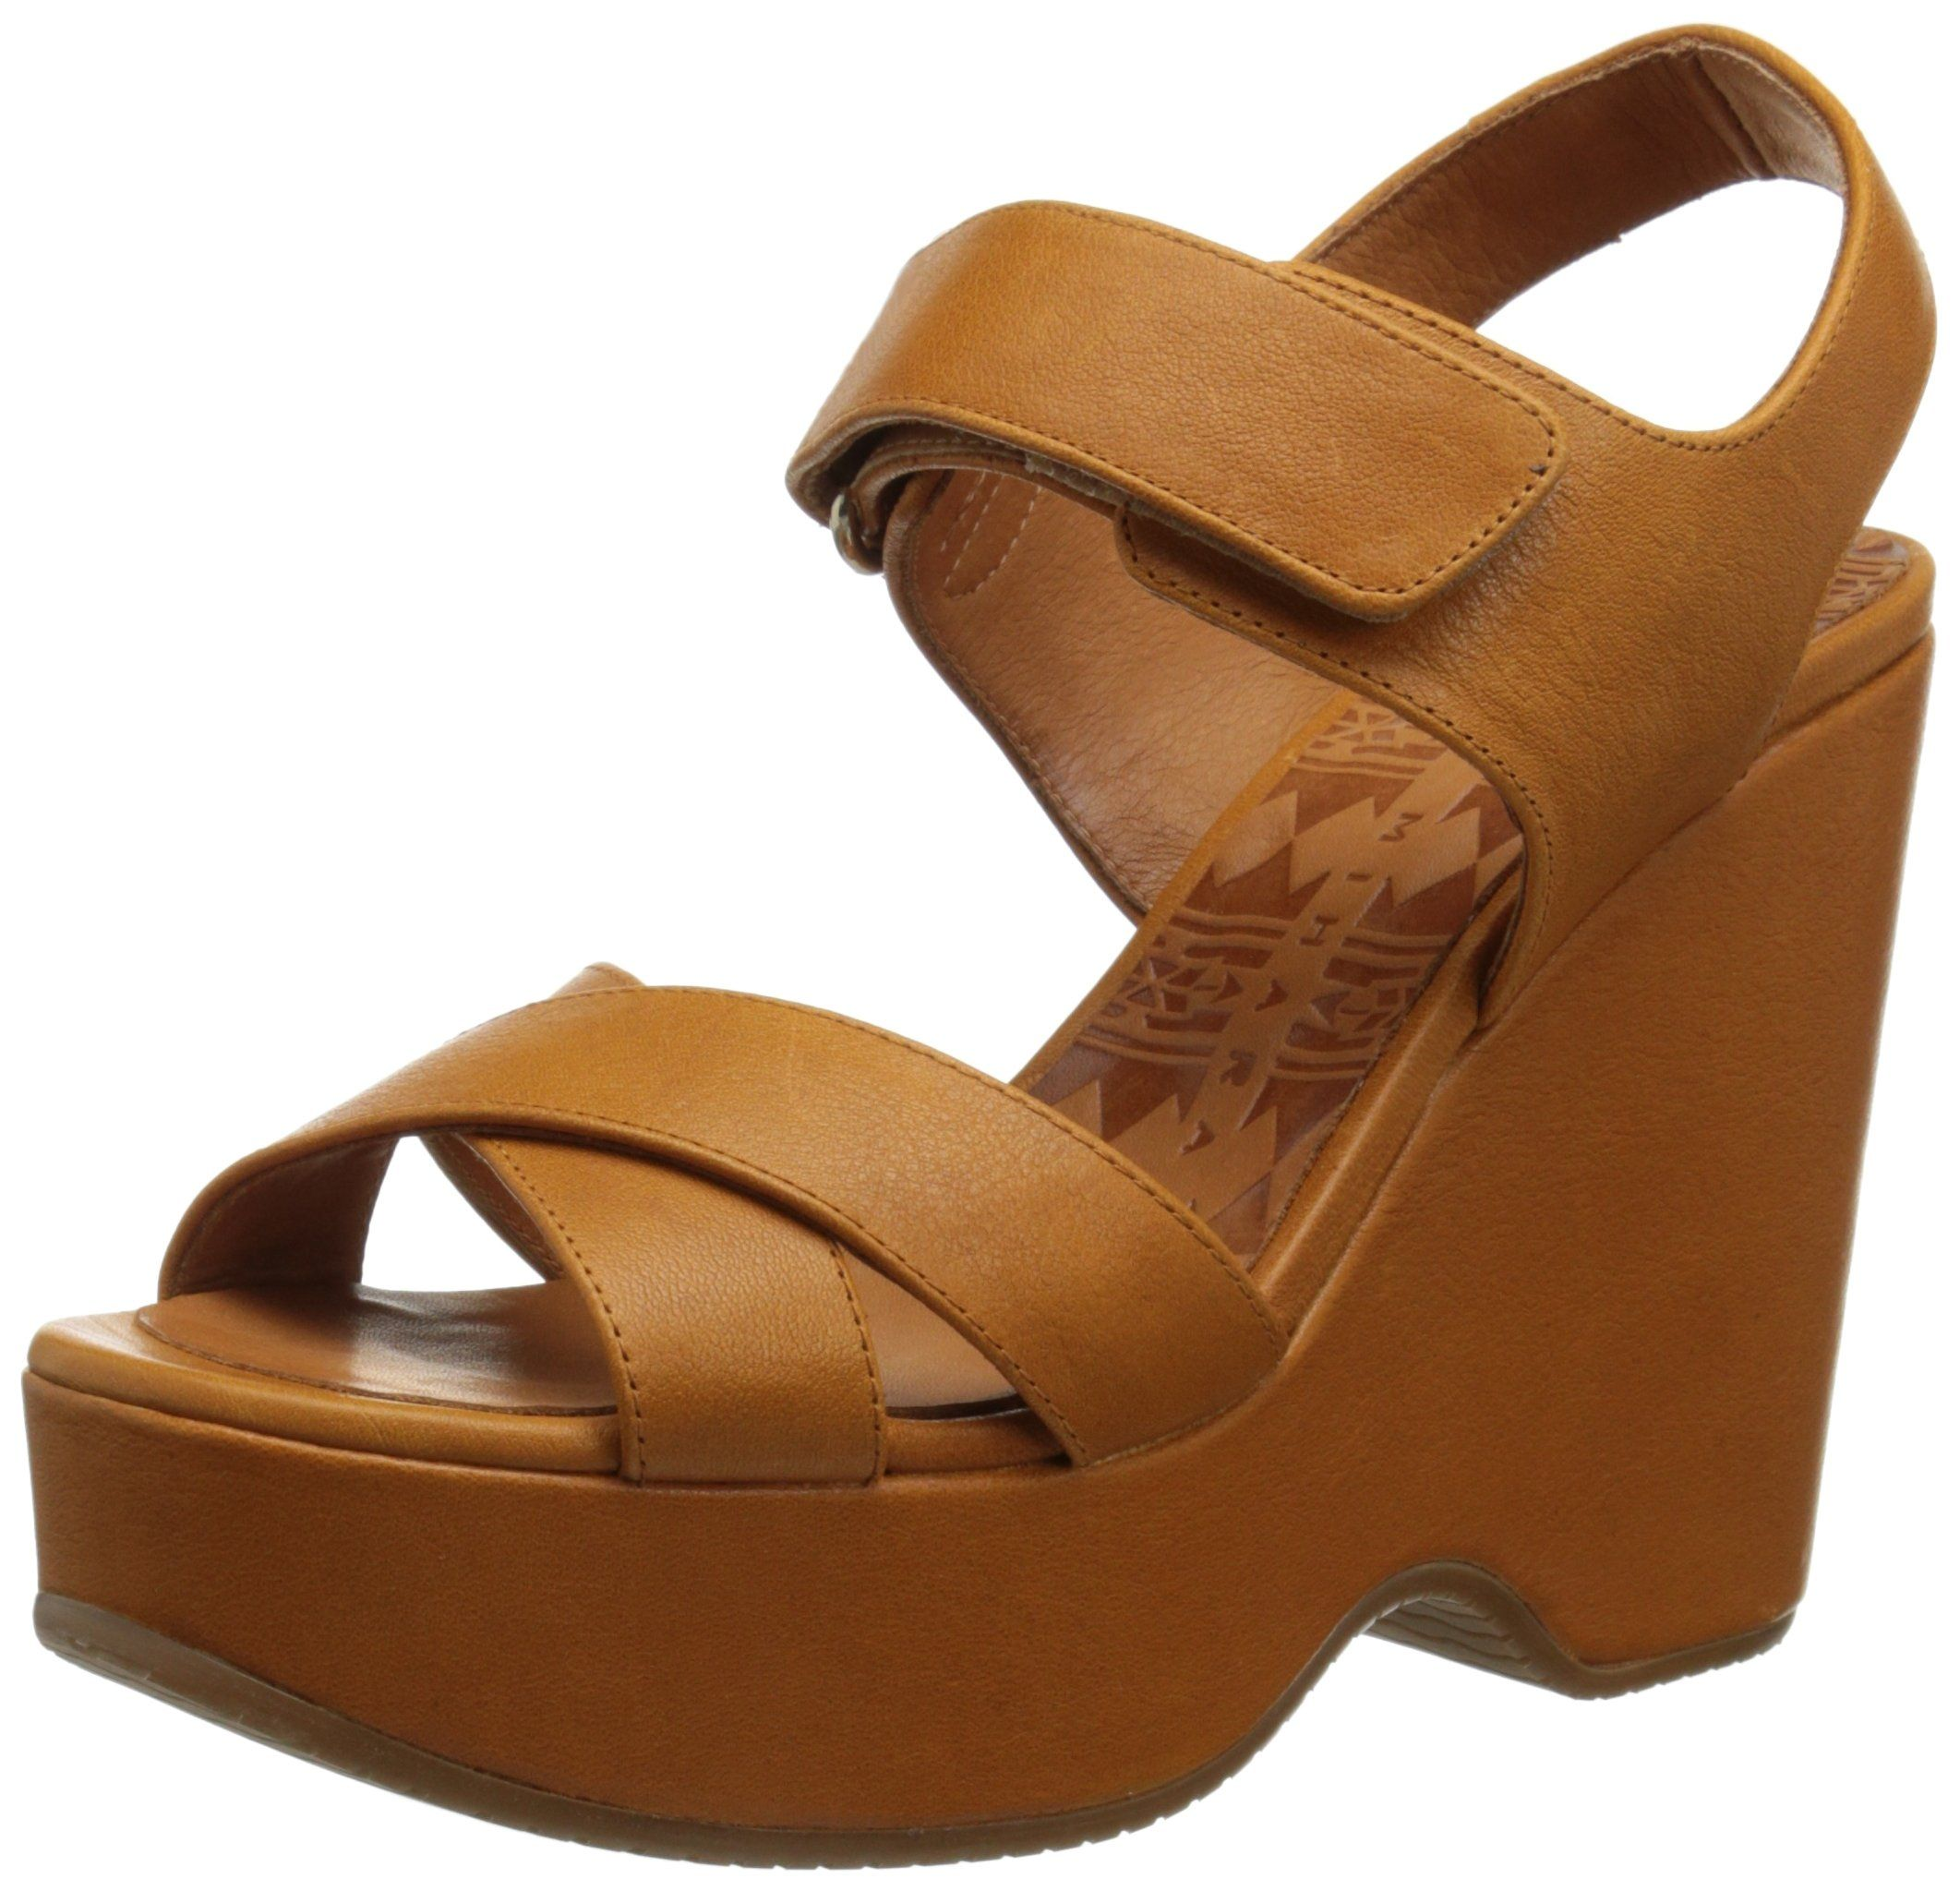 8f461b343cc Chie Mihara Women s Baranda Dress Sandal  425